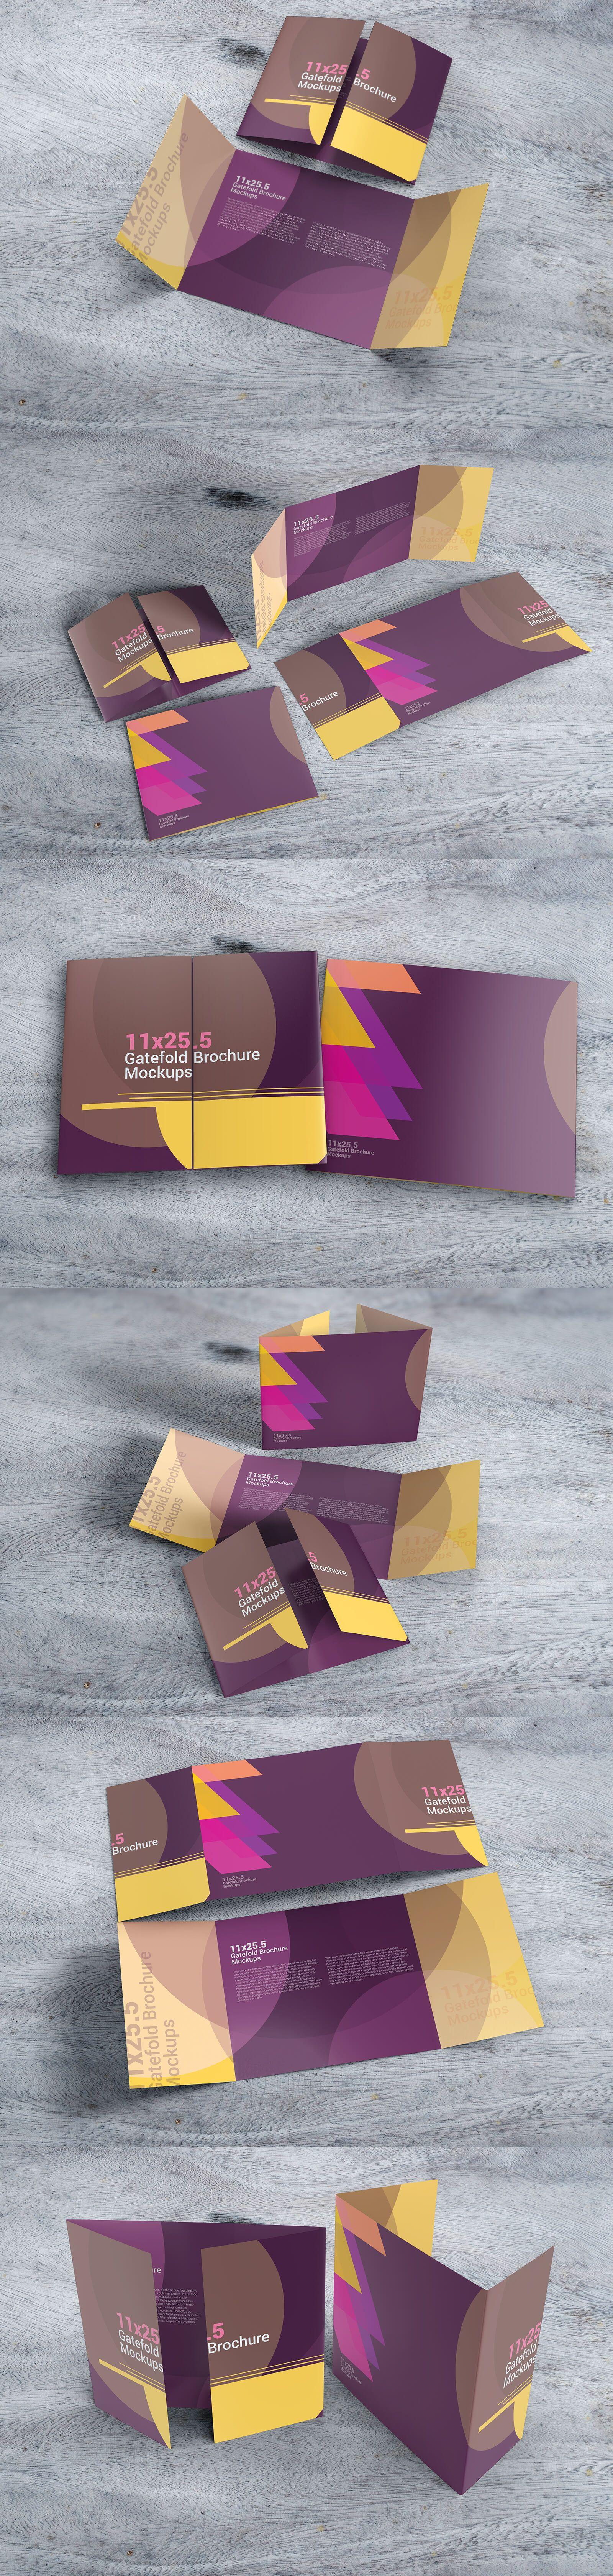 11x25 5 Gatefold Brochure Mockups On Brochure Size Brochure Brochures Mockups